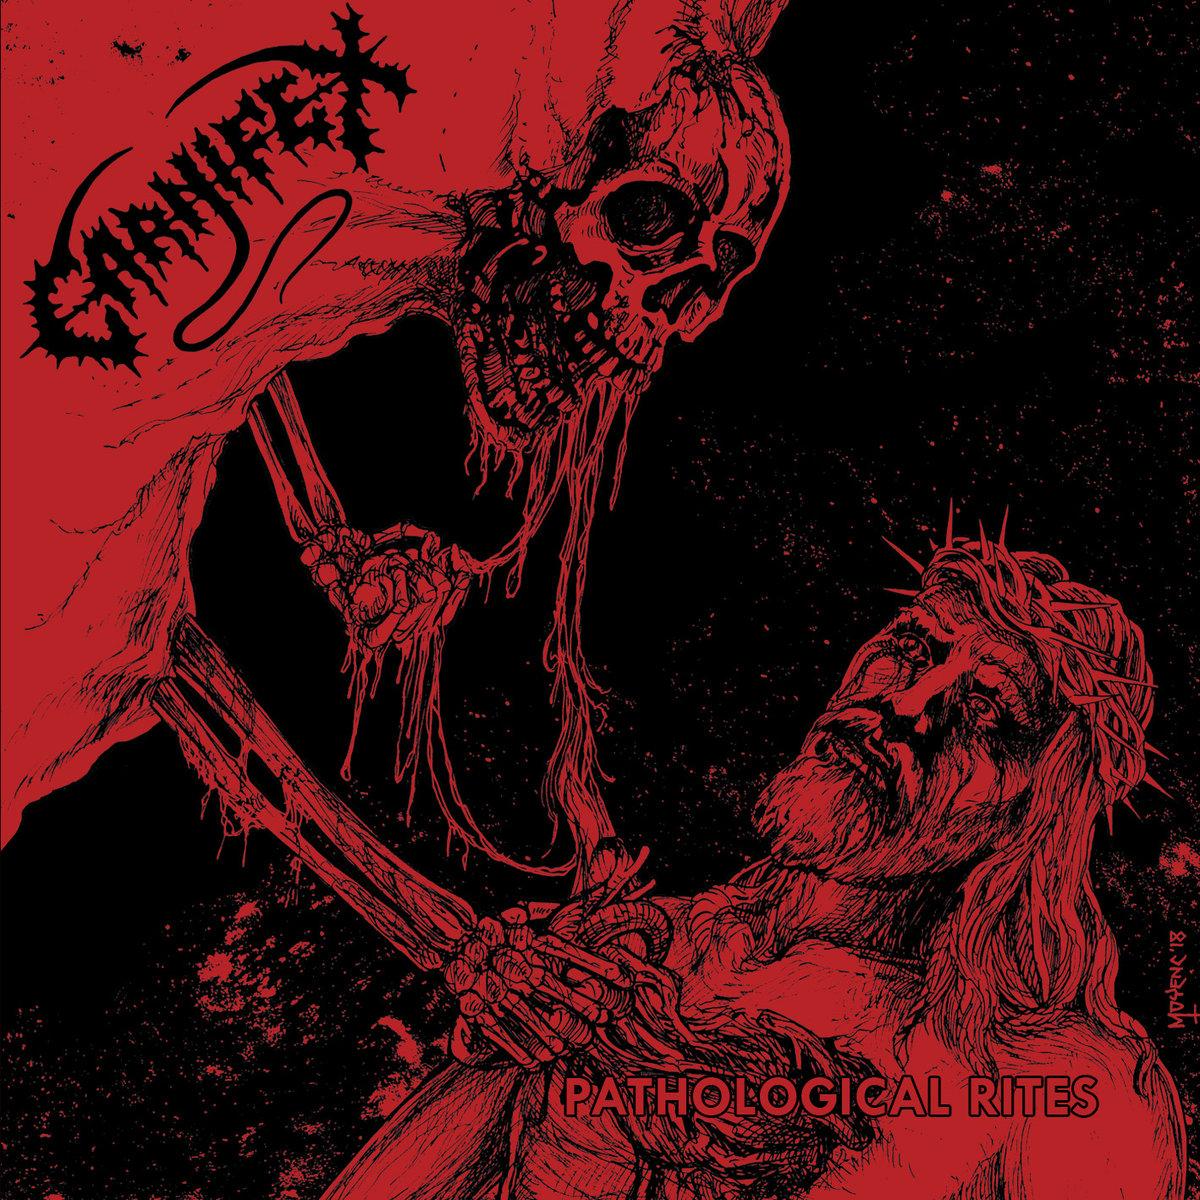 carnifex [fin] – pathological rites